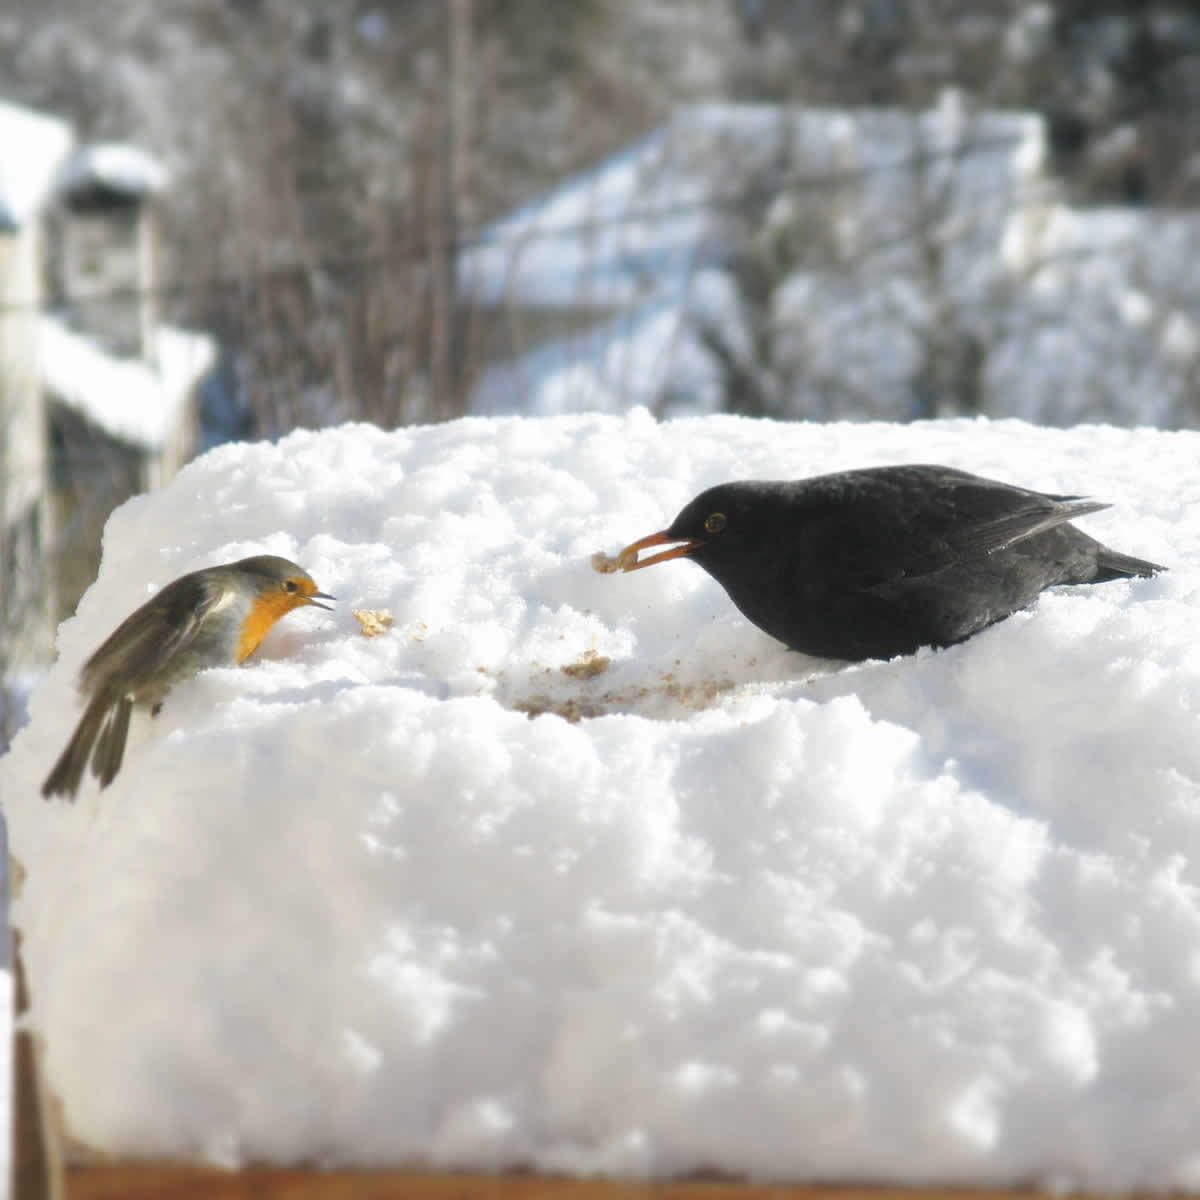 Blackbird vs Red Robin, duel for the breadcrumb!